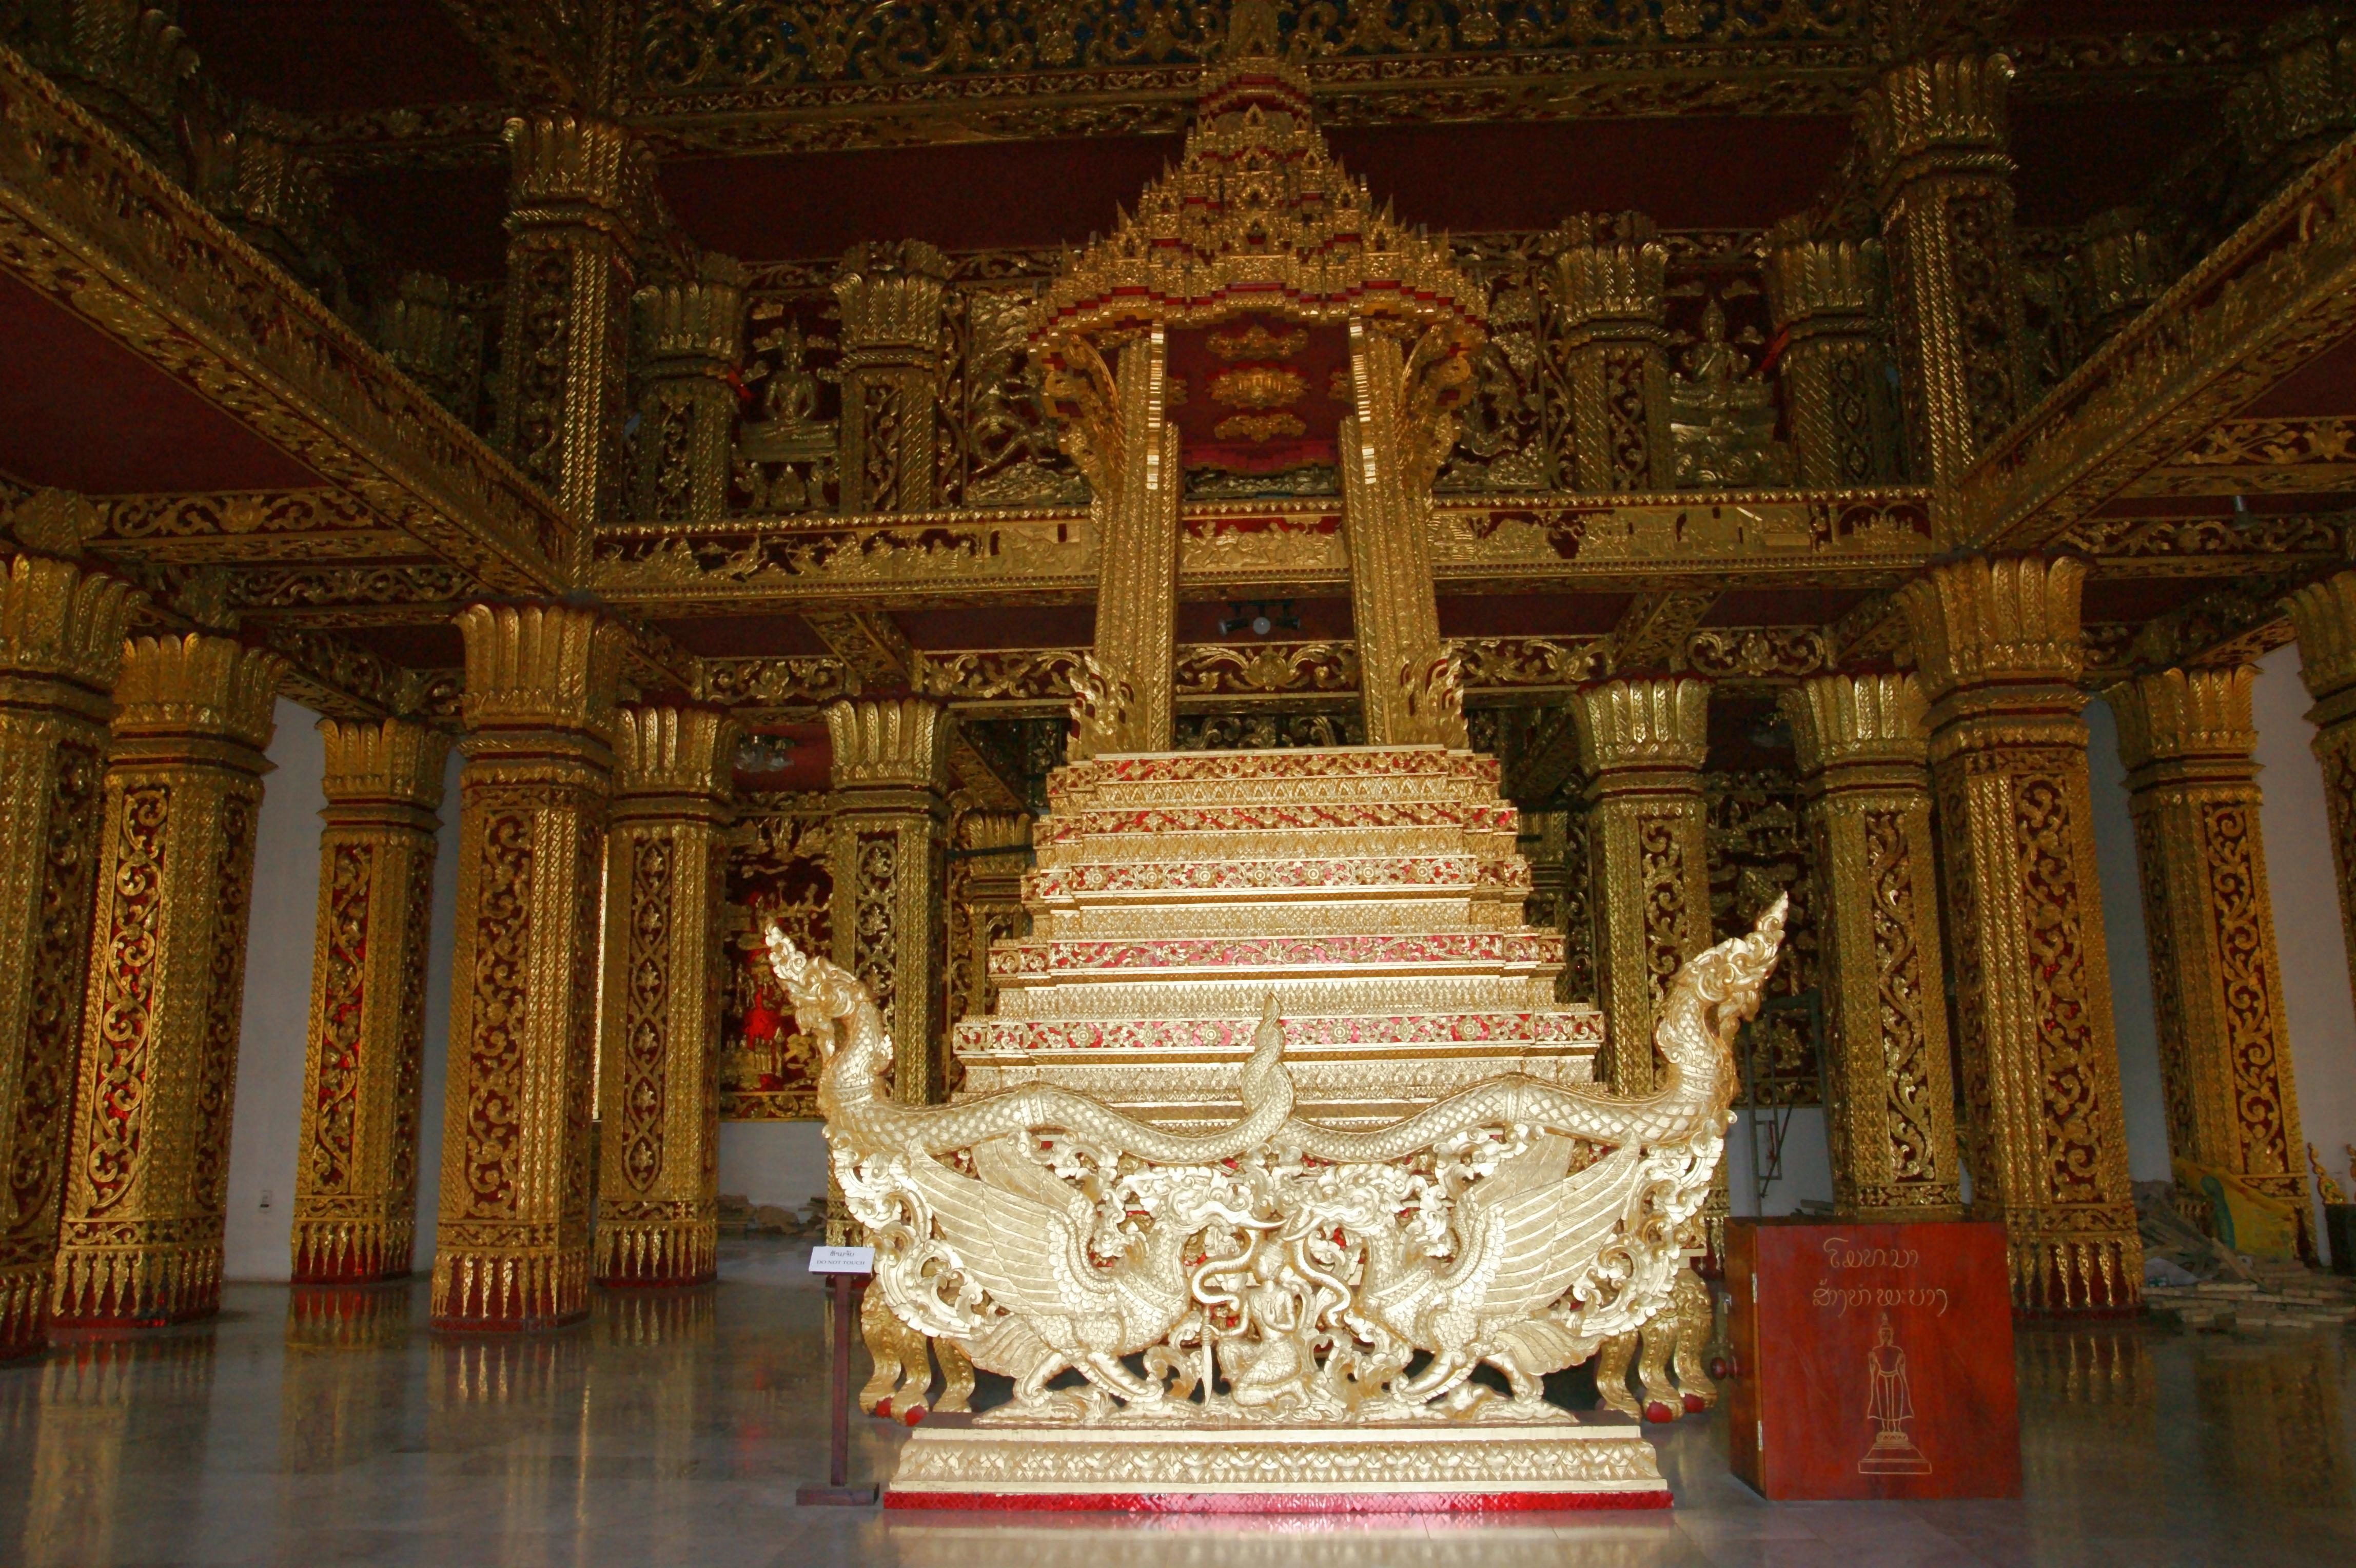 file haw kham palace interior art 2009 jpg. Black Bedroom Furniture Sets. Home Design Ideas